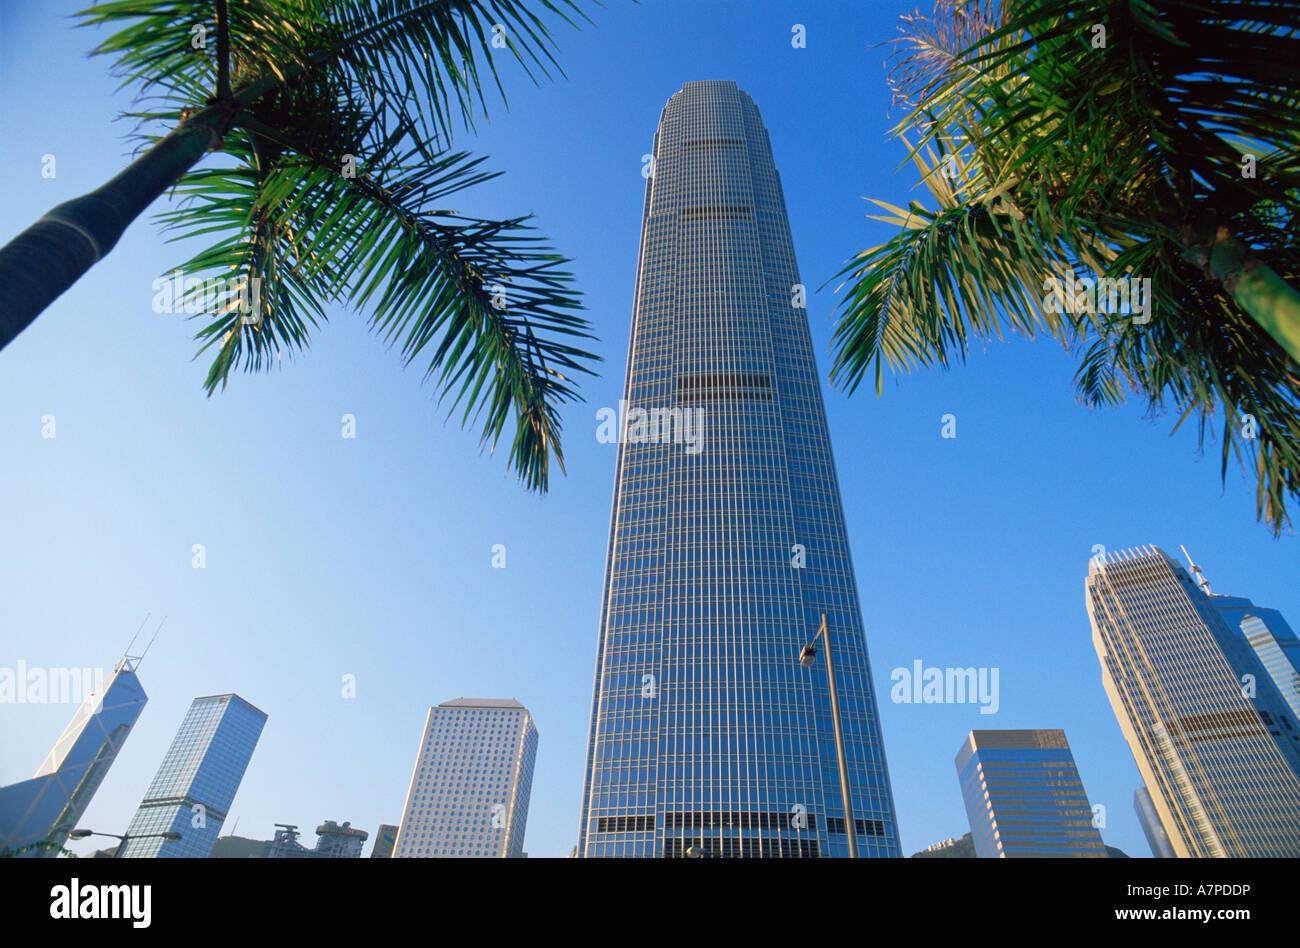 Cina, Hong Kong, centrale, IFC International Finance Centre Building Immagini Stock